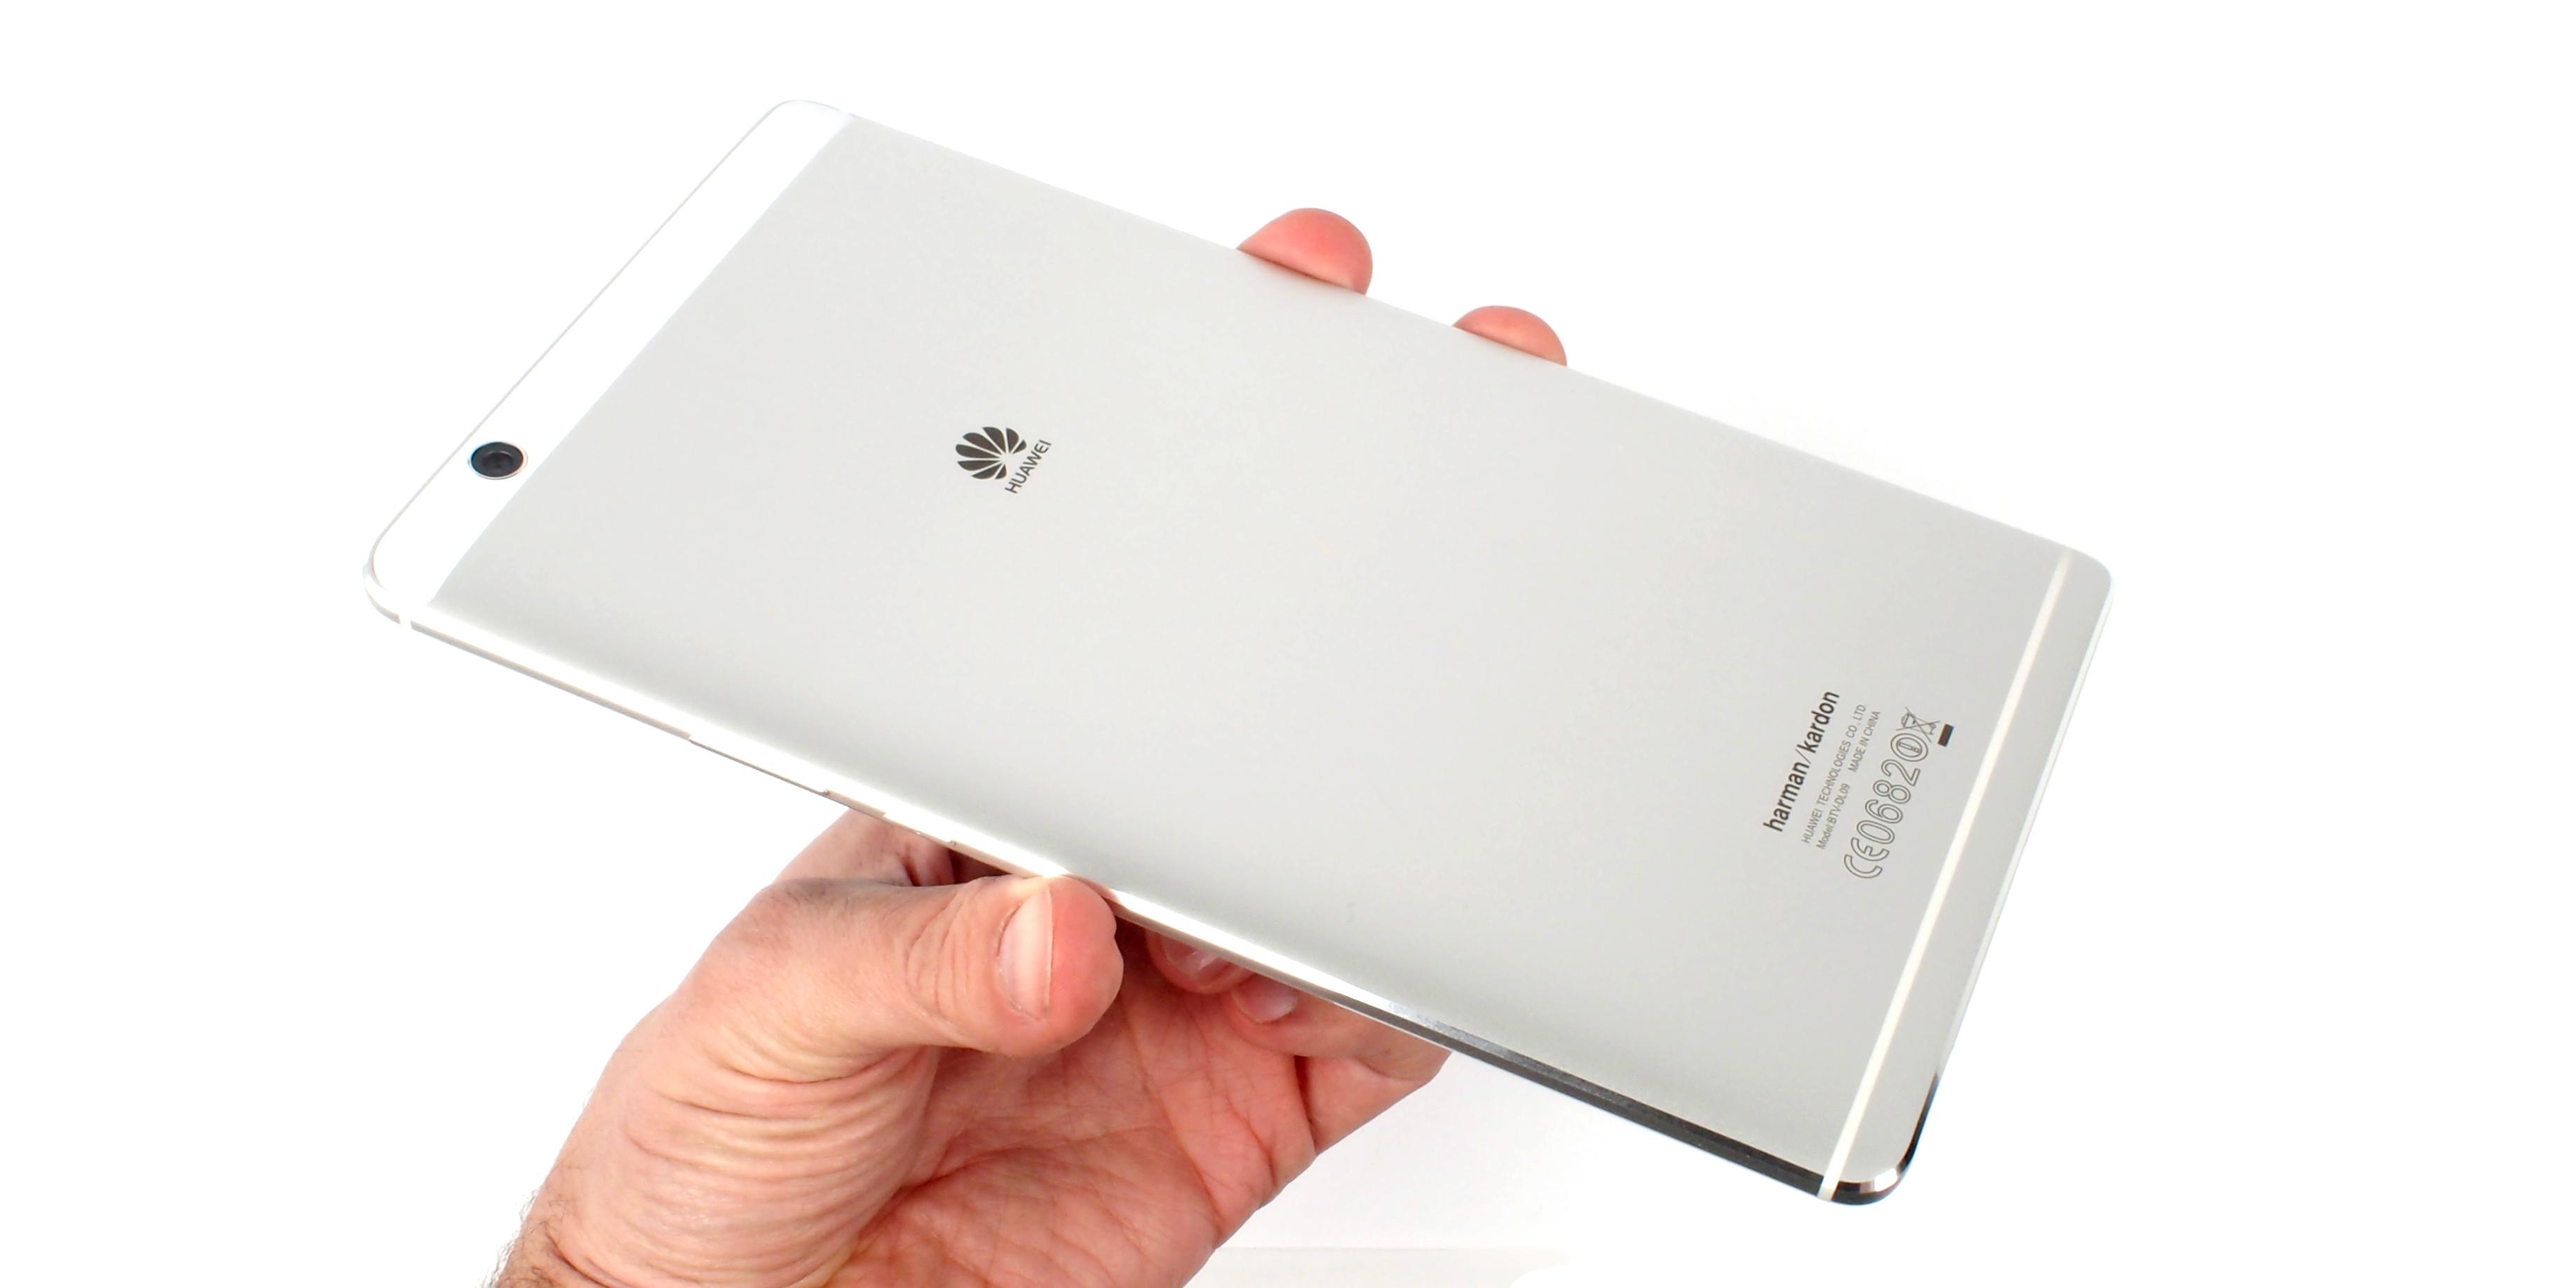 dcd51501a Huawei MediaPad M3: multimediální bestie a zvuk Harman/Kardon [recenze] –  MobilMania.cz